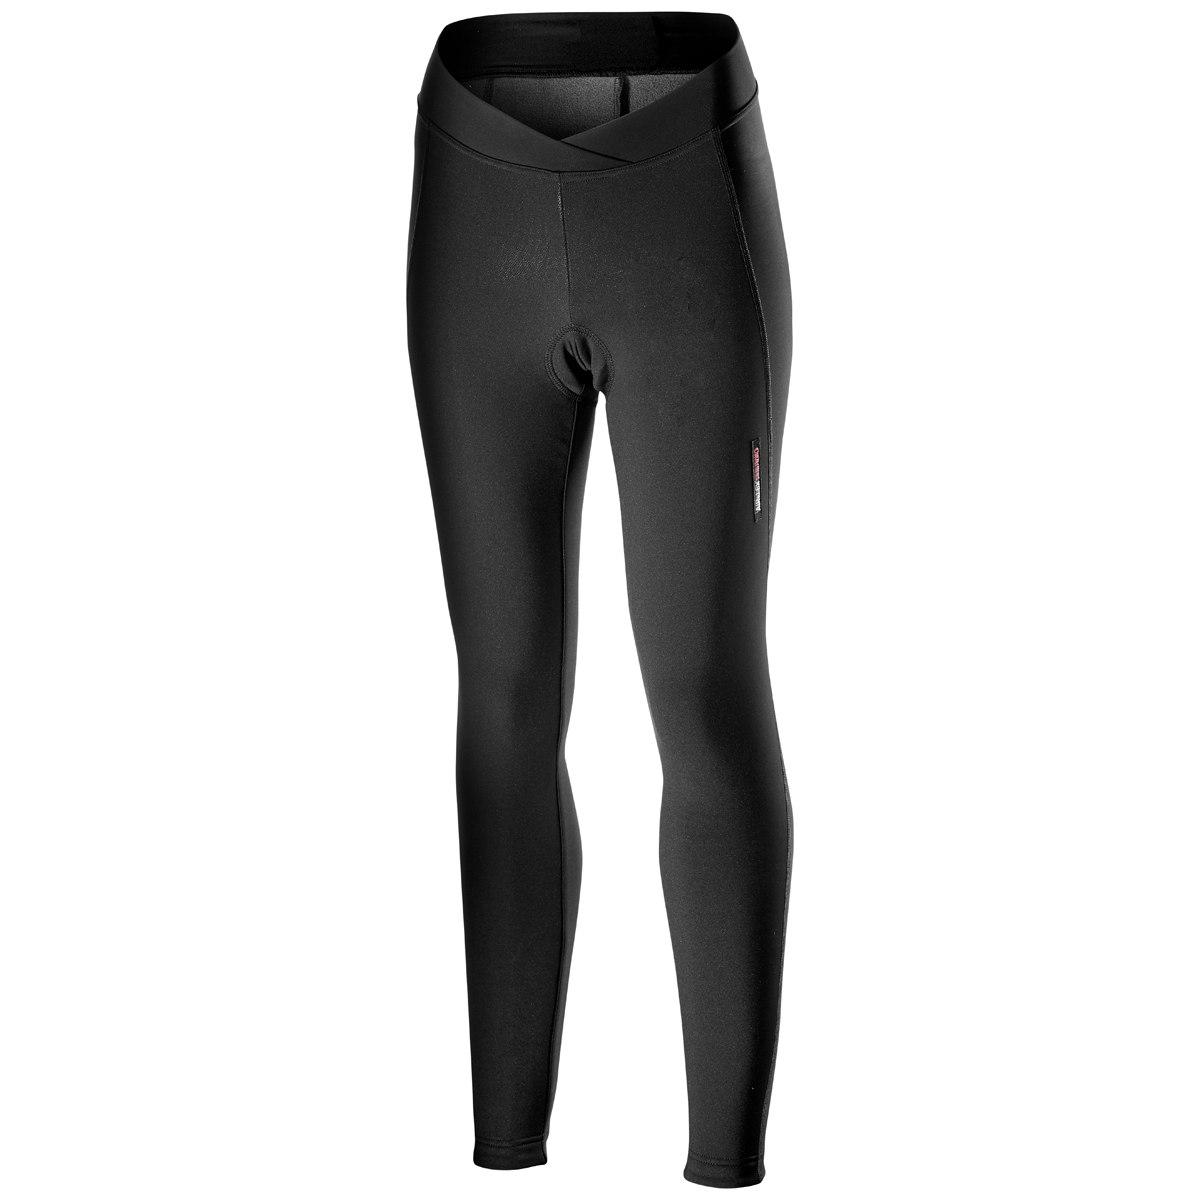 Castelli Meno Wind W Tight Women's - black 010